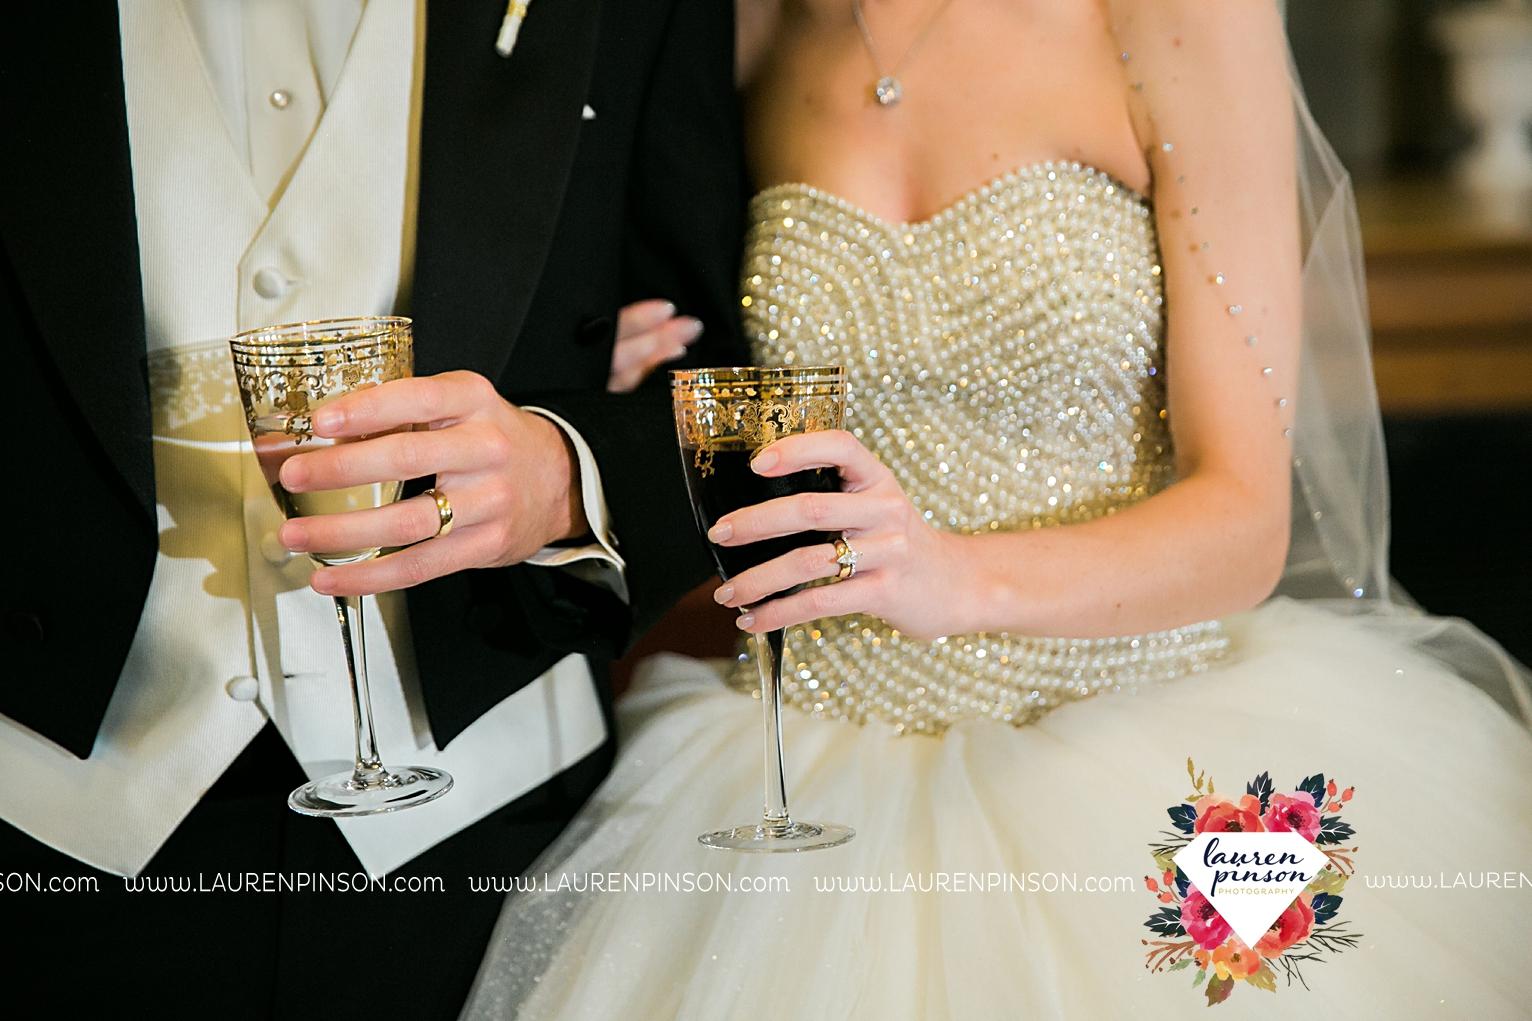 wichita-falls-texas-wedding-photographer-the-forum-by-the-kemp-mayfield-events-ulta-gold-glitter_2878.jpg